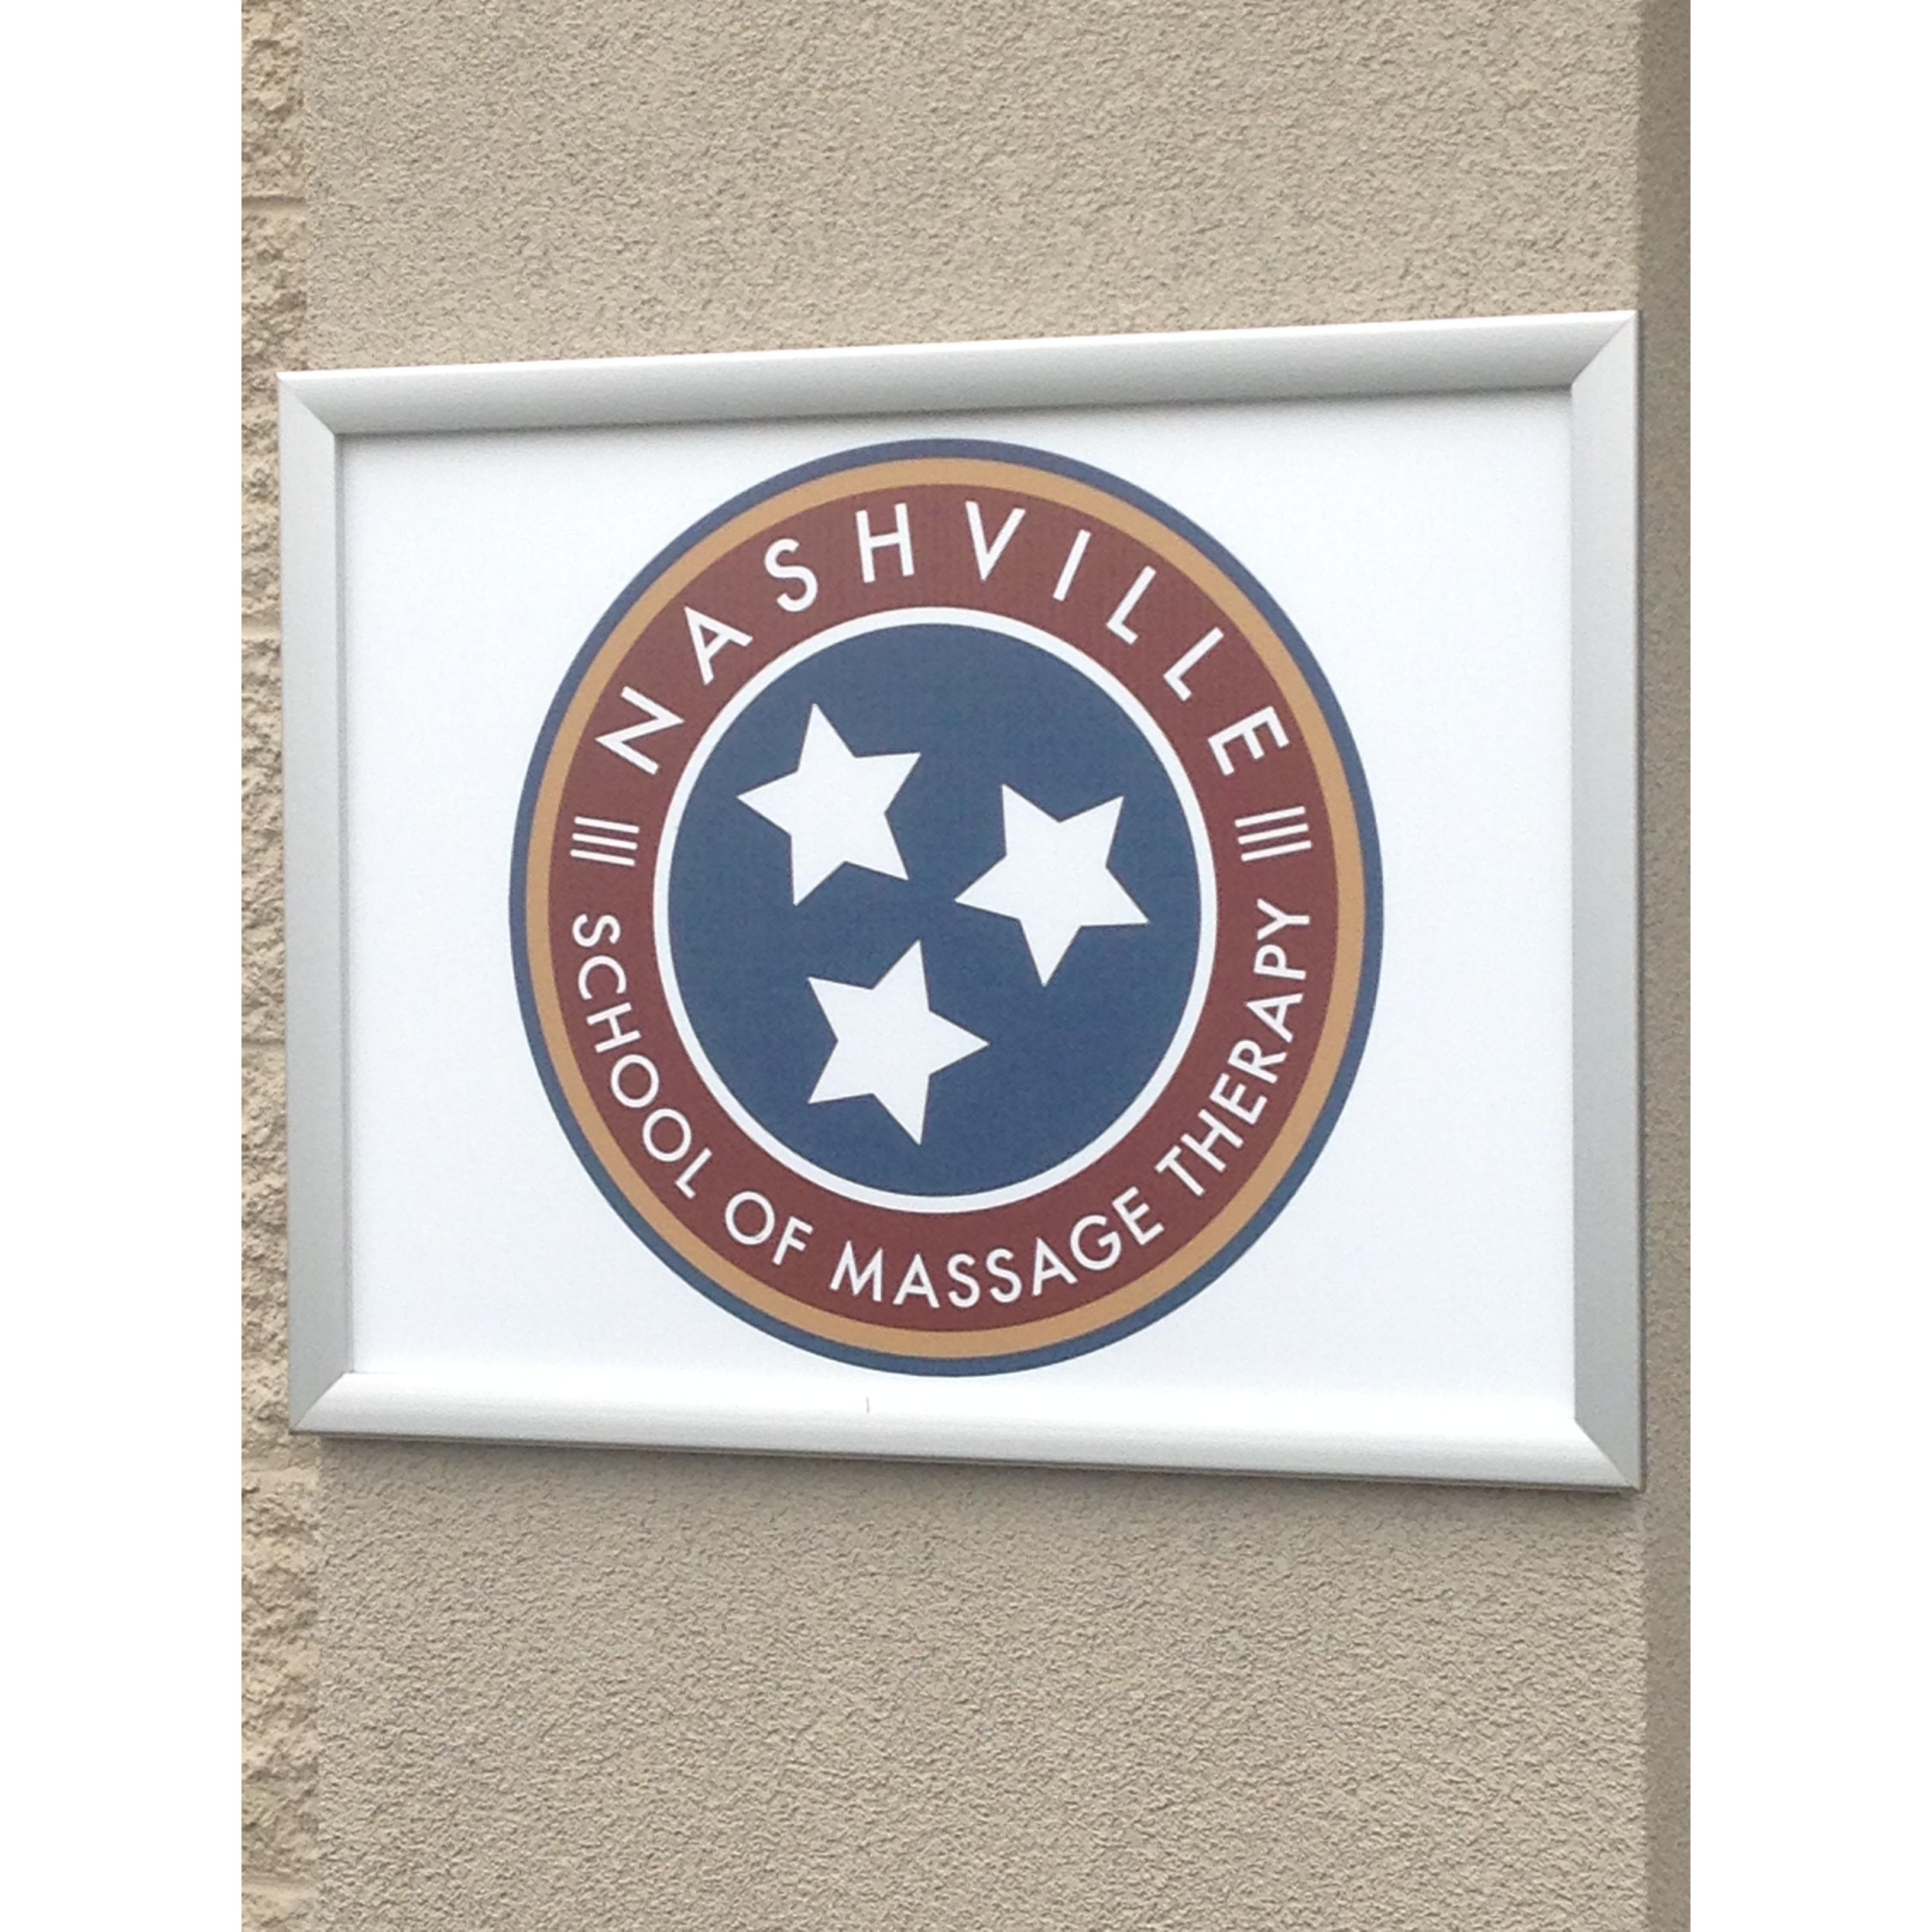 Nashville School of Massage Therapy